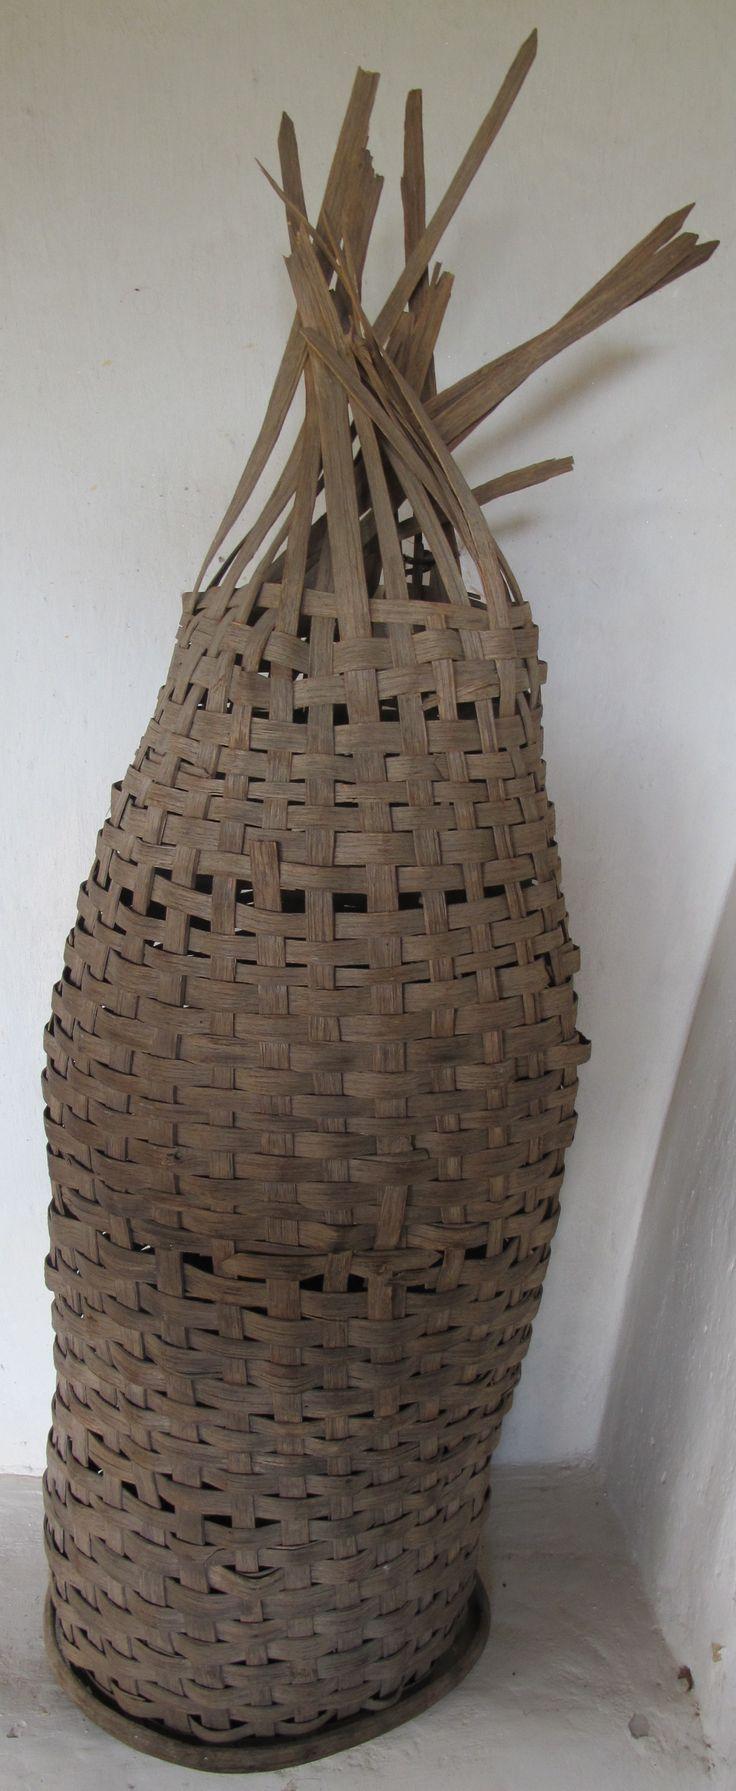 Early 20th Century Fishing Weir (Basket)